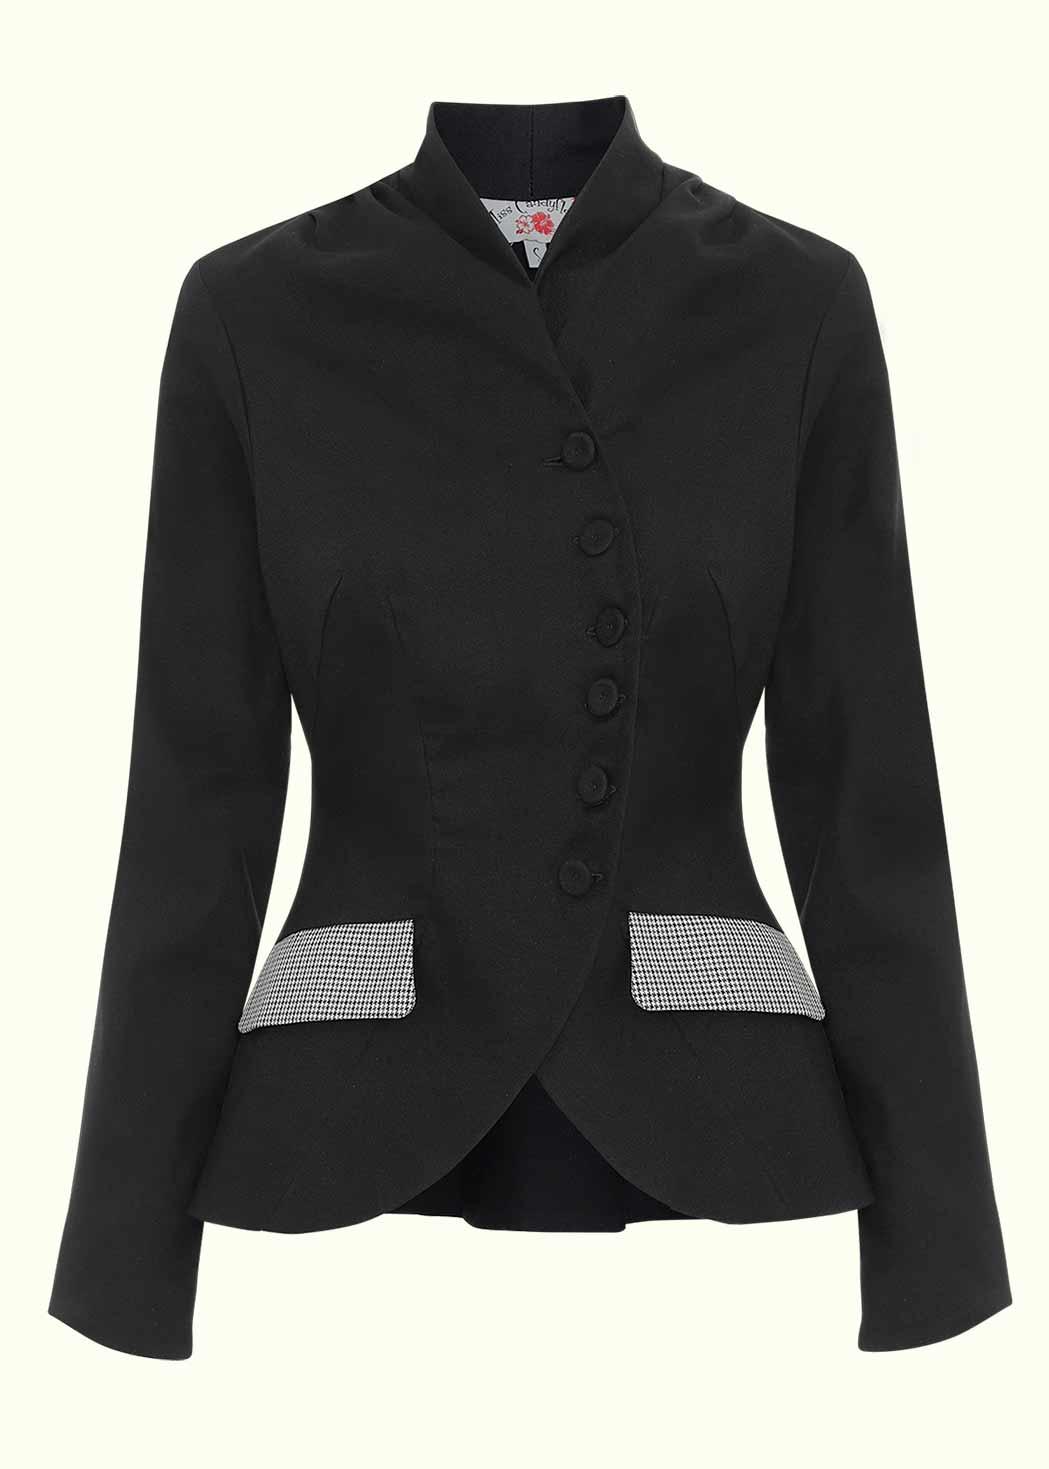 Navy blue retro blazer jacket from Miss Candyfloss